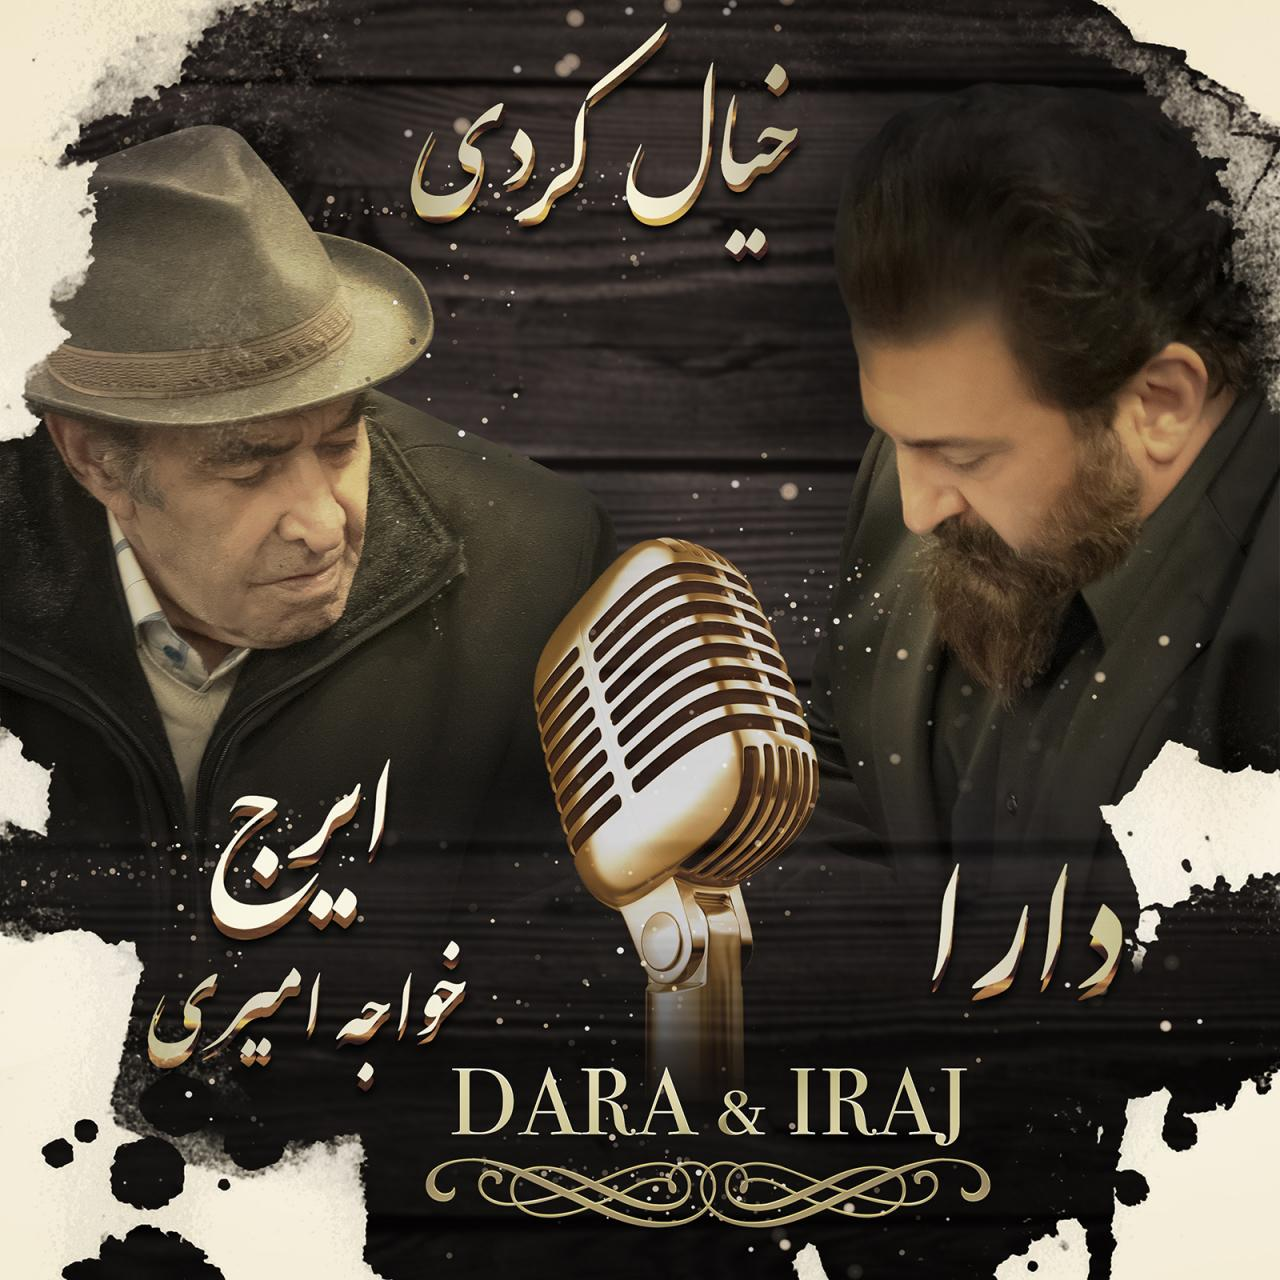 Dara Recording Artist - Khiyal Kardi - دانلود آهنگ دارا و ایرج خواجه امیری به نام خیال کردی